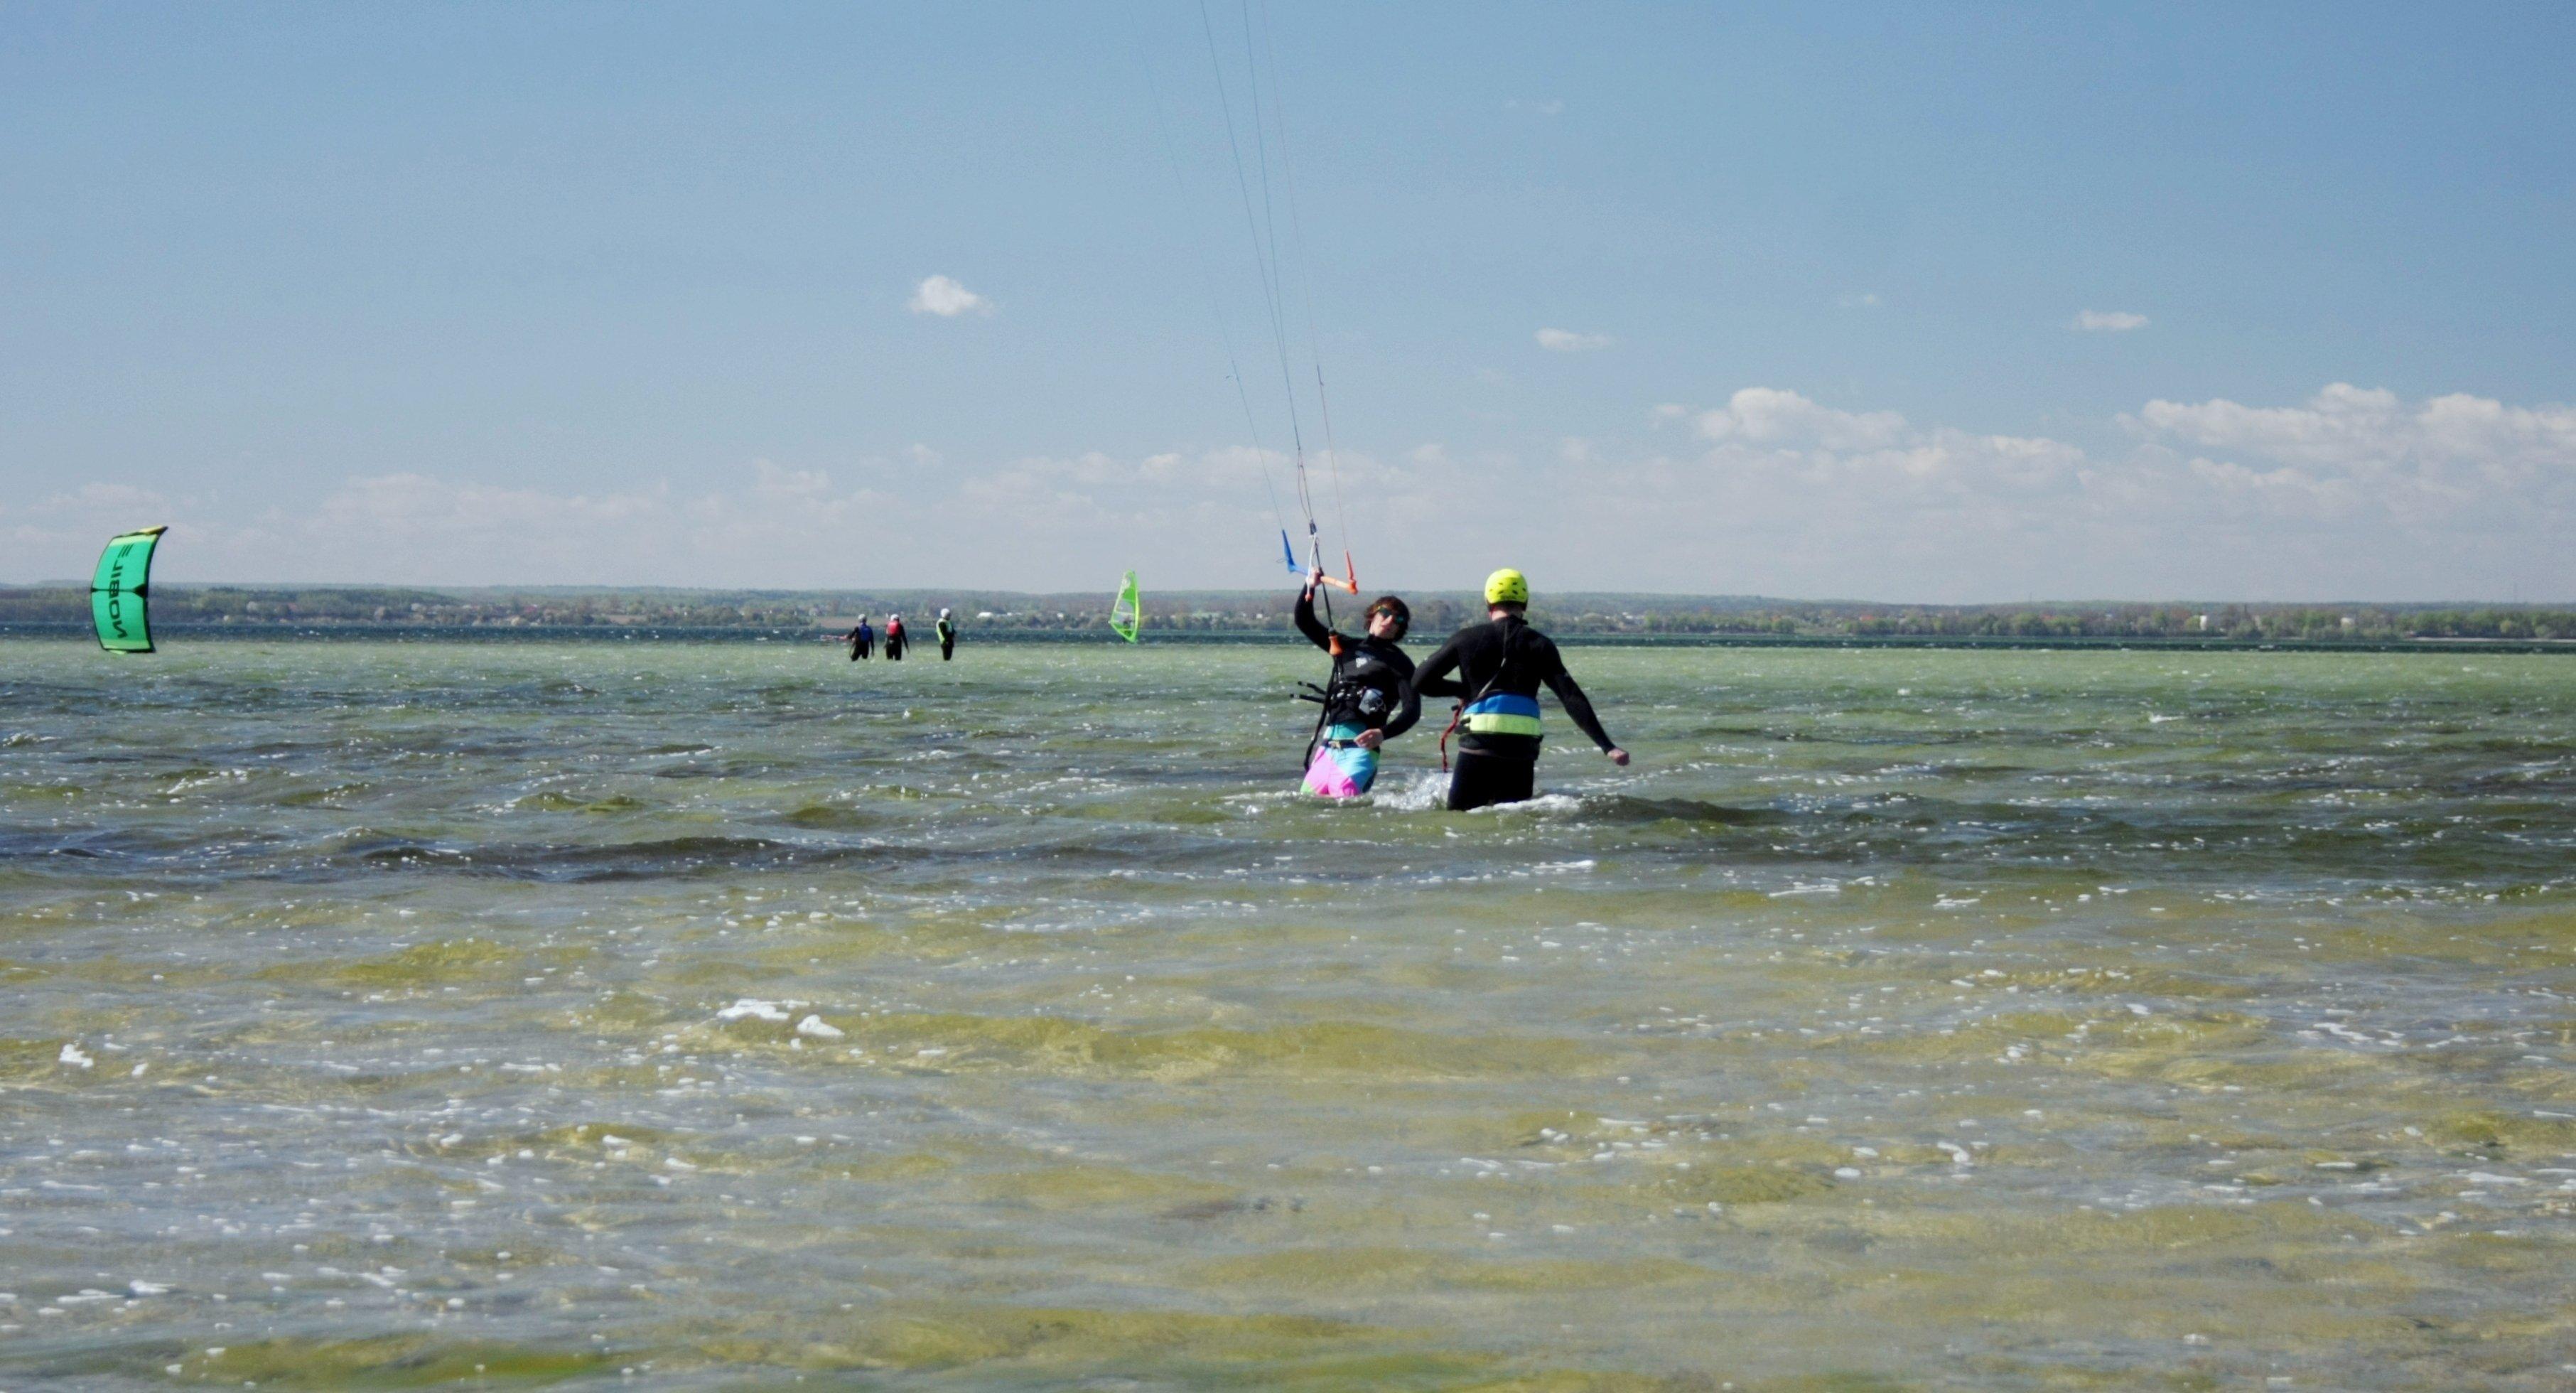 kitecrew-szko_C5_82a-kitesurfingu-kursy-c